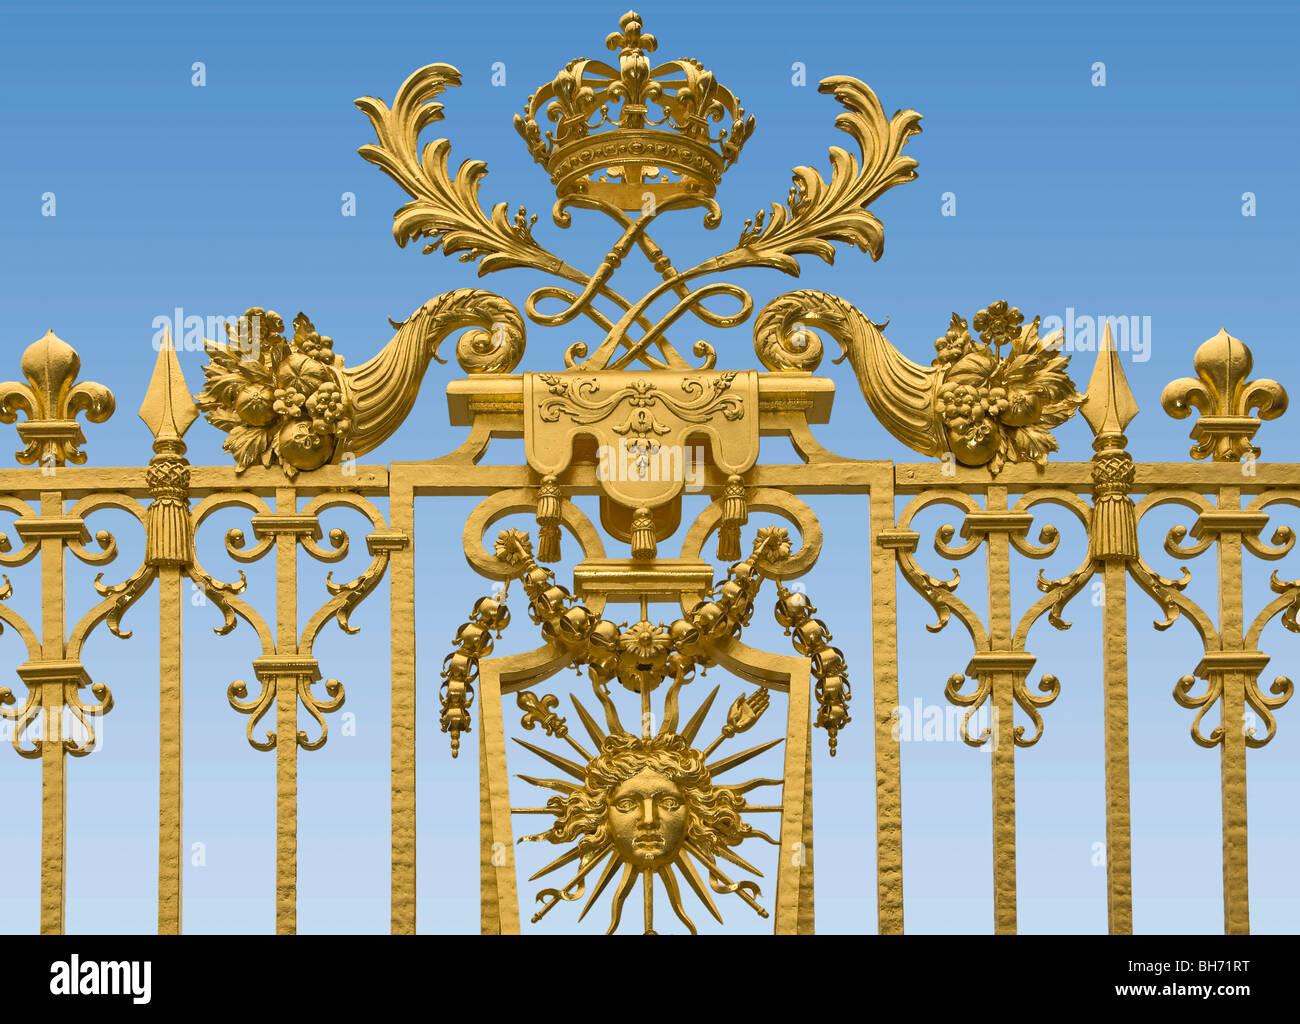 Versailles Roi soleil Symbol Paris France - Stock Image